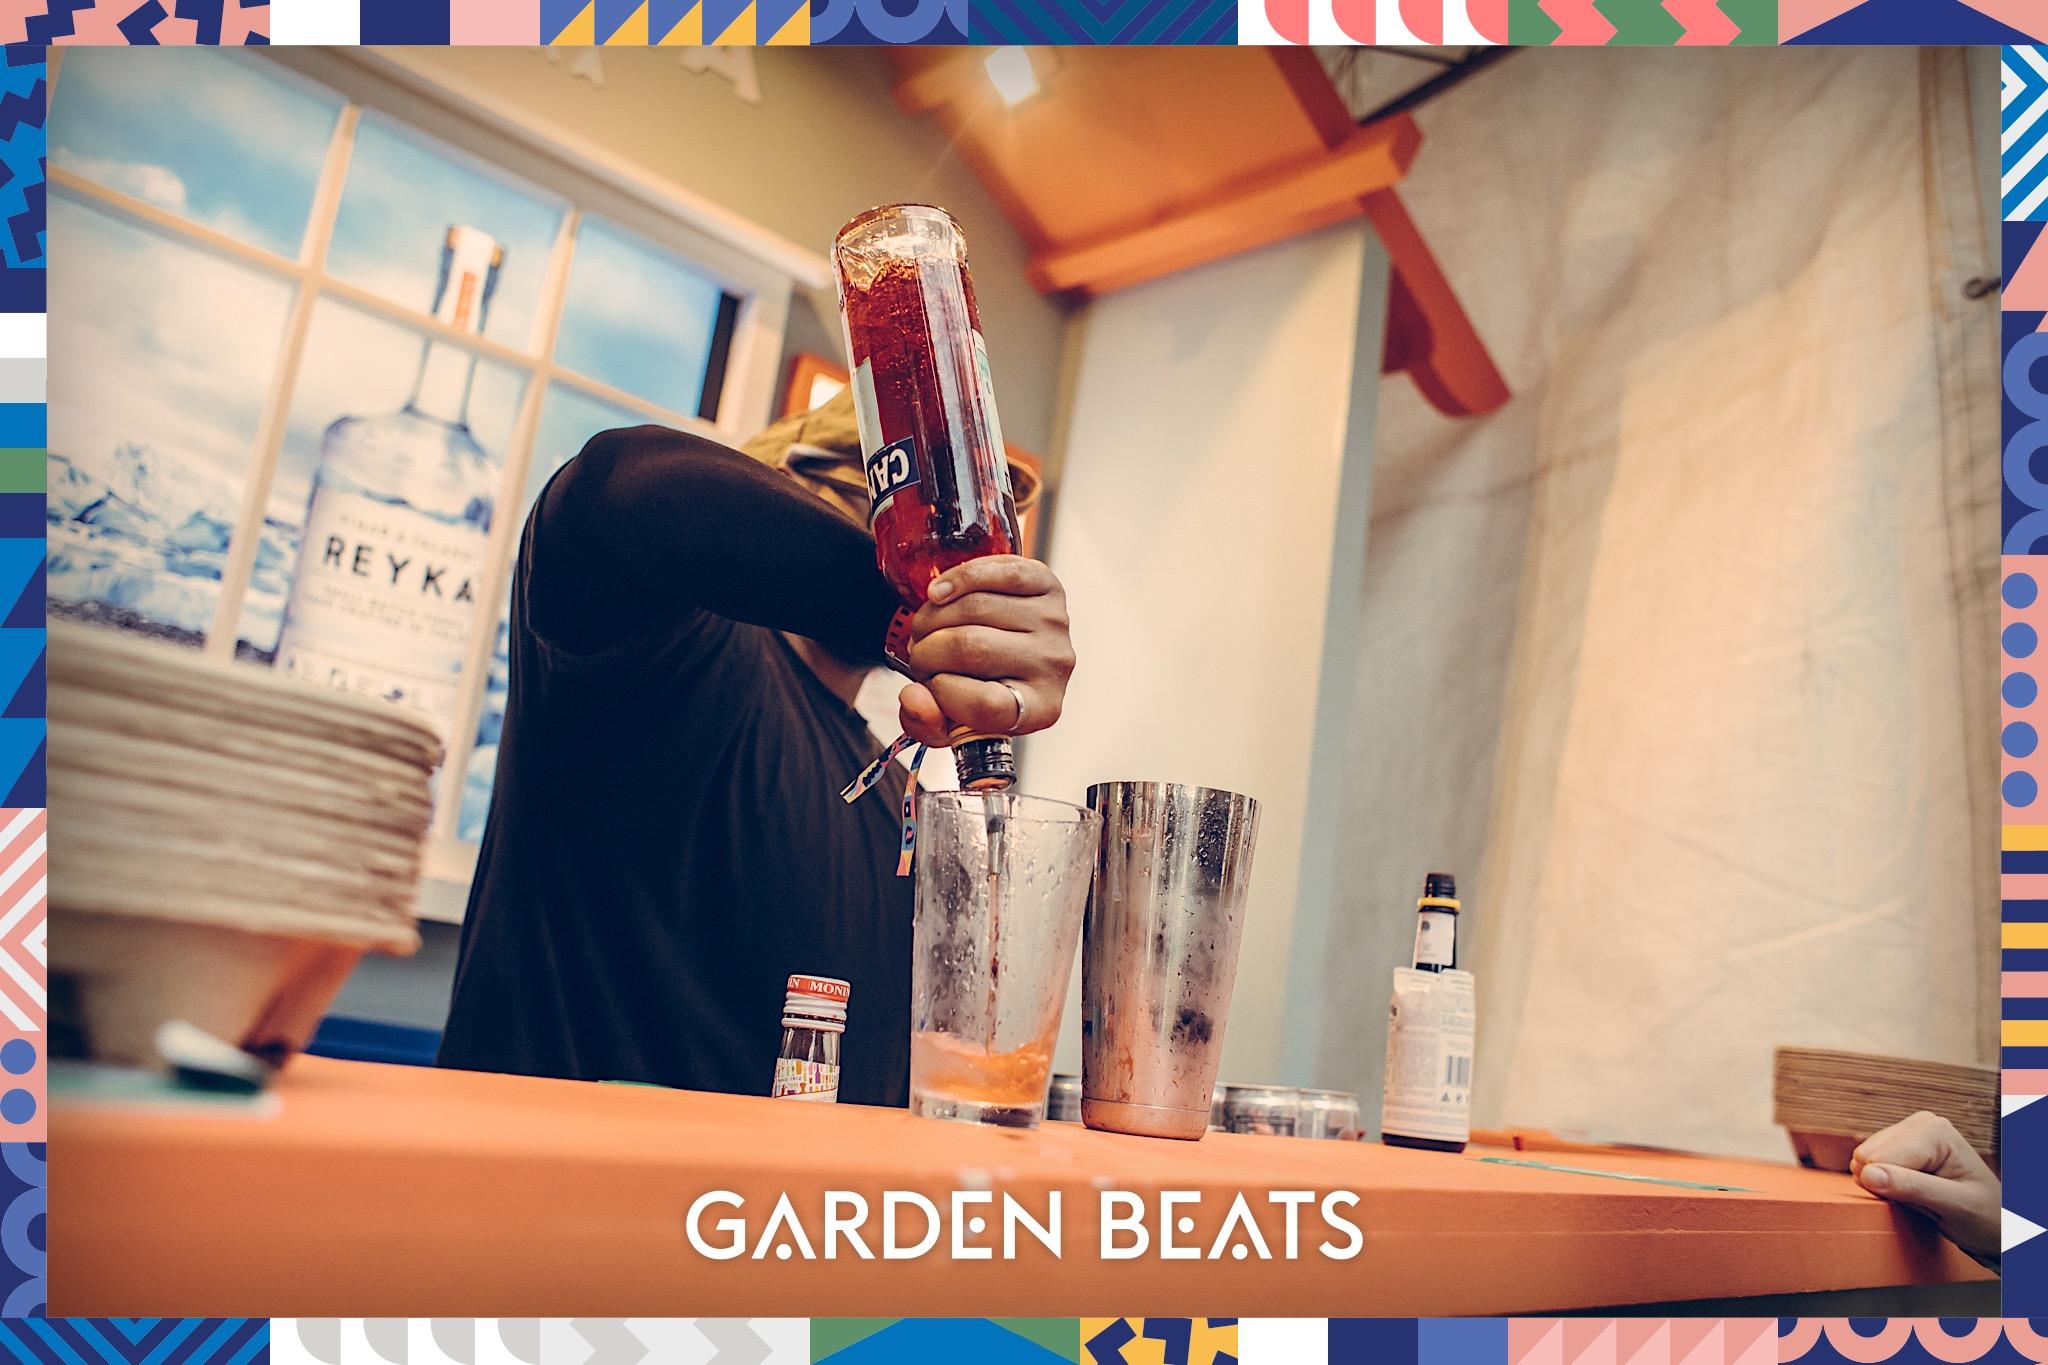 03032018_GardenBeats_Colossal429_Watermarked.jpg